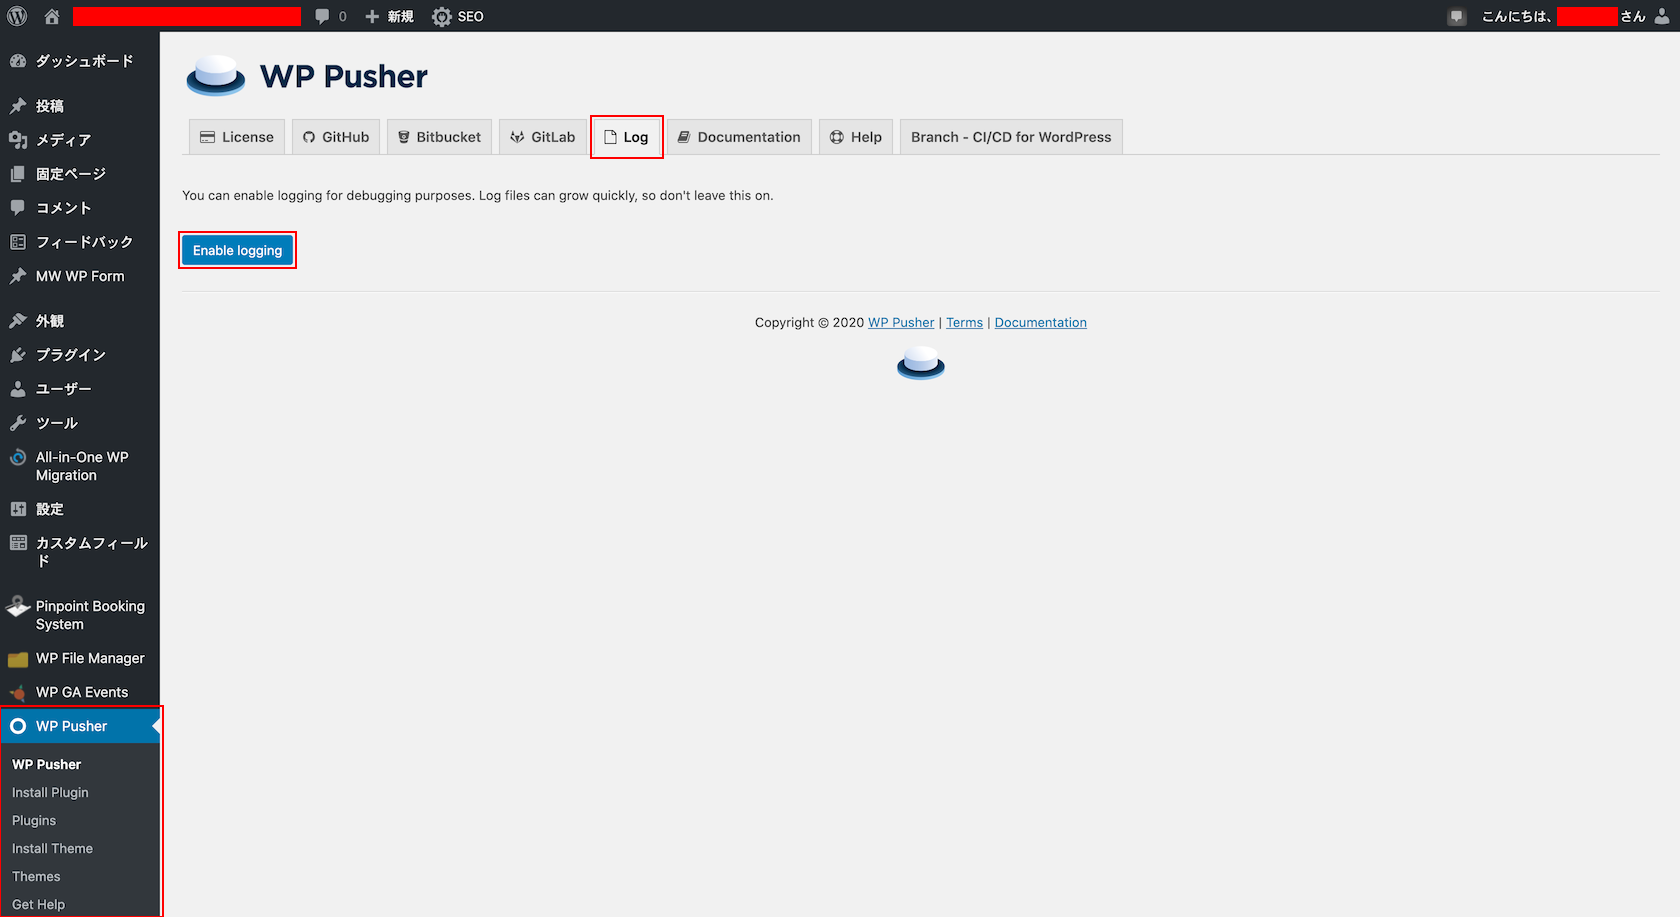 FireShot Capture 300 - WP Pusher ‹ 【Shifter 検証用】現場クラウド Conne — WordPress - testgenbasupportcom.local.png